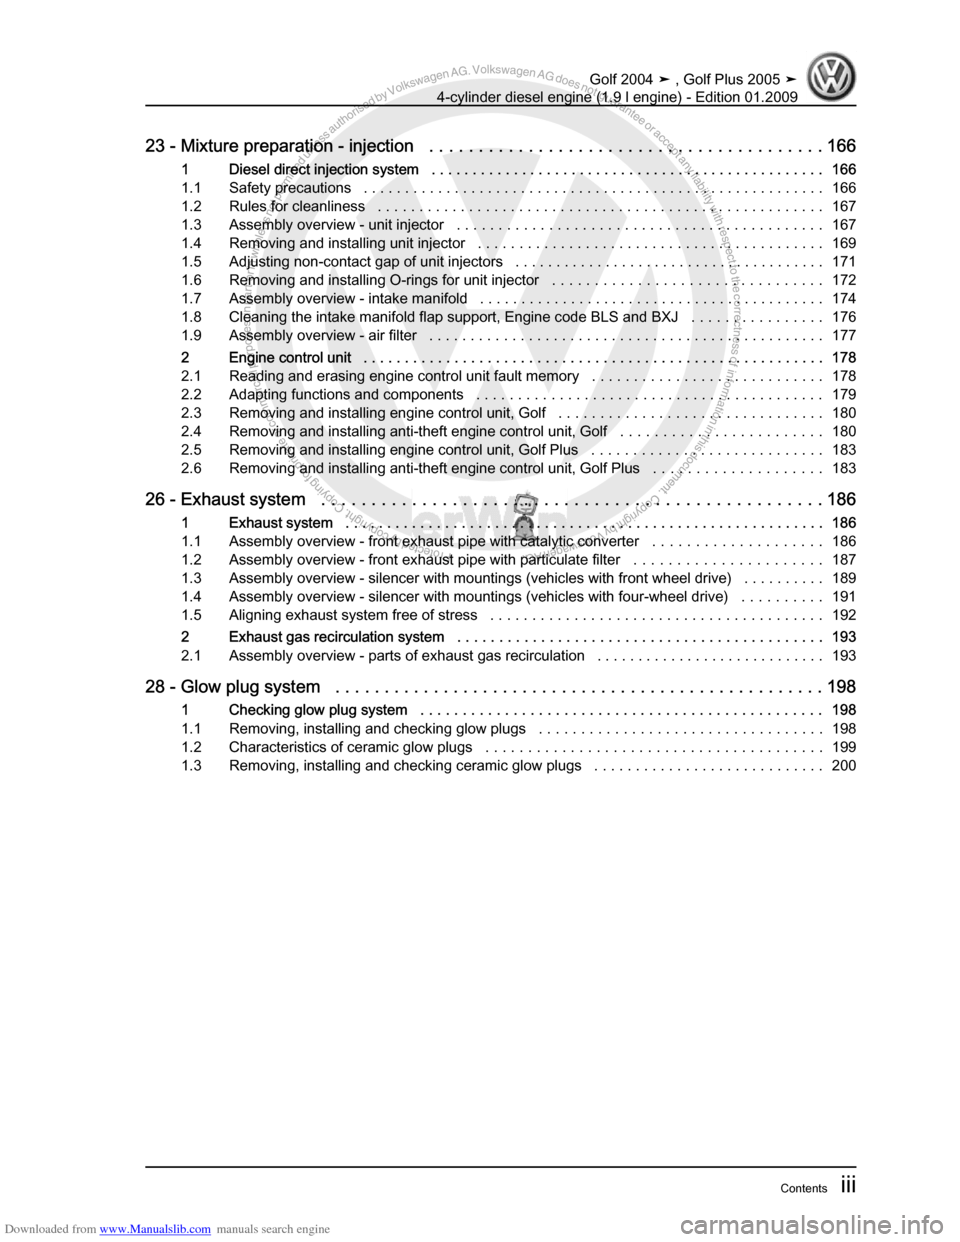 VOLKSWAGEN GOLF PLUS 2005 1K / 5.G Service Workshop Manual